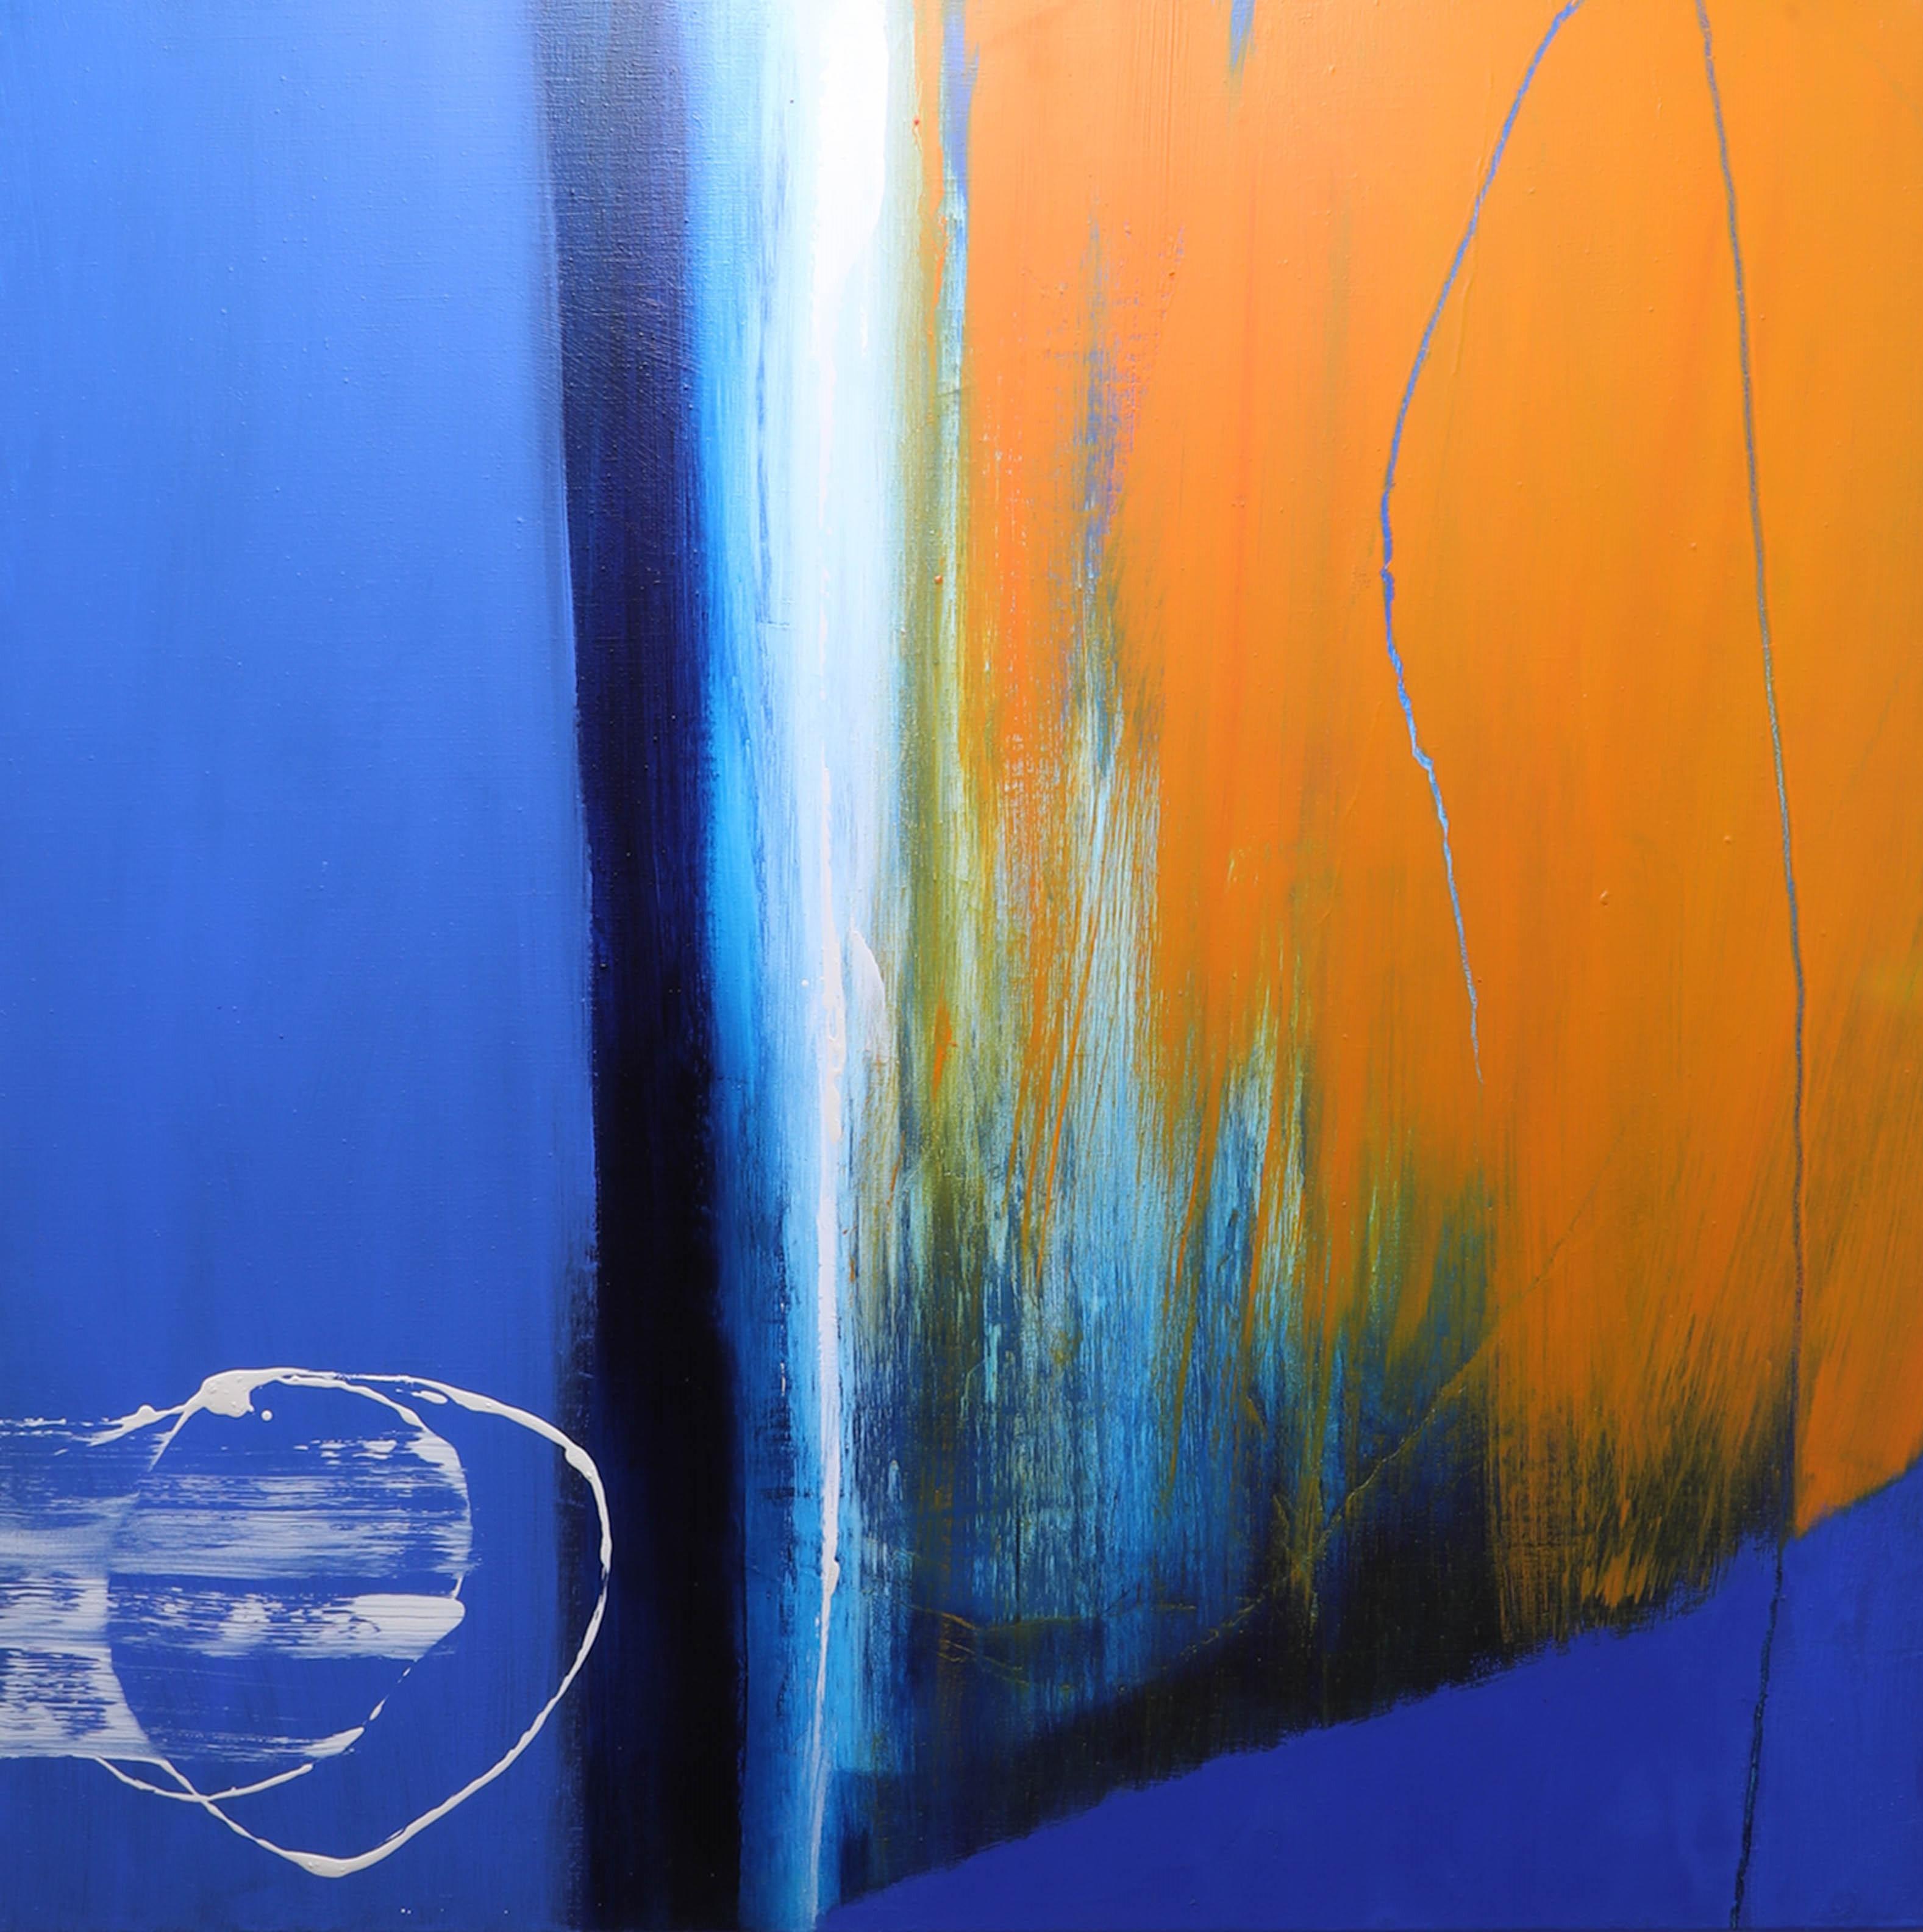 Lot 016 - Neil Canning (b 1960) oil on canvas, 'Vertigo', 91cm x 91cm, signed, in a floating frame,